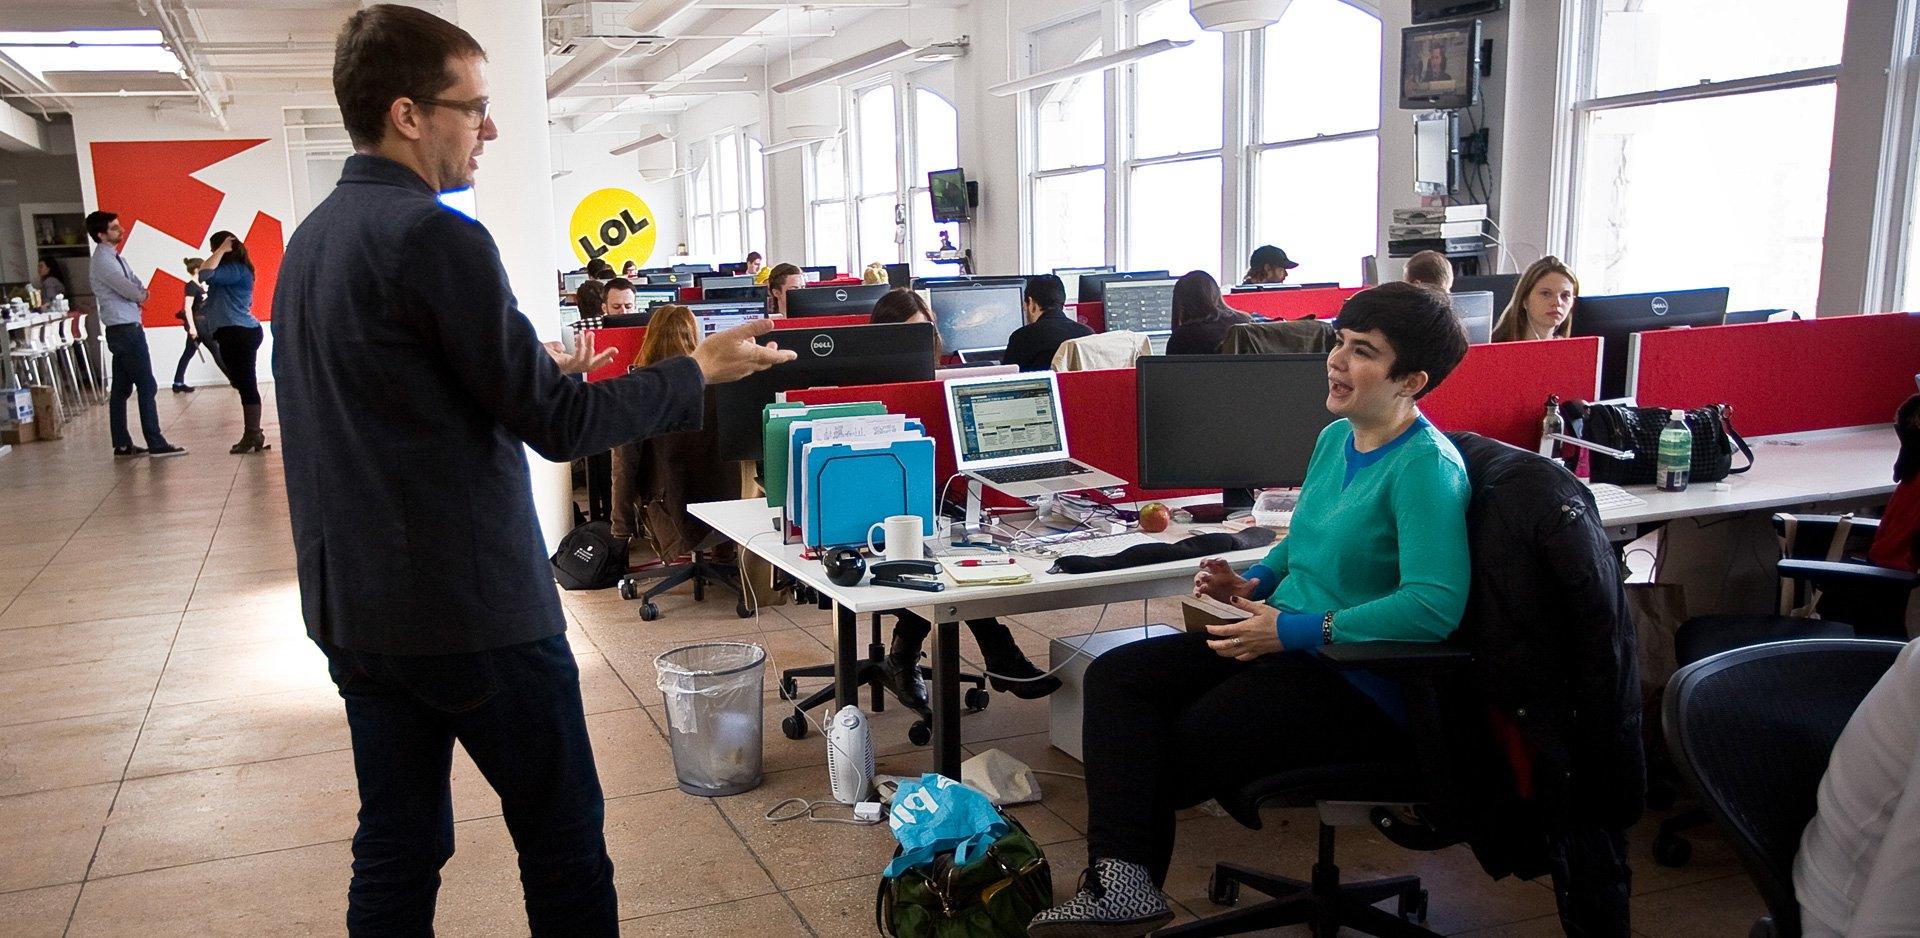 The Eternal Return of BuzzFeed - The Atlantic